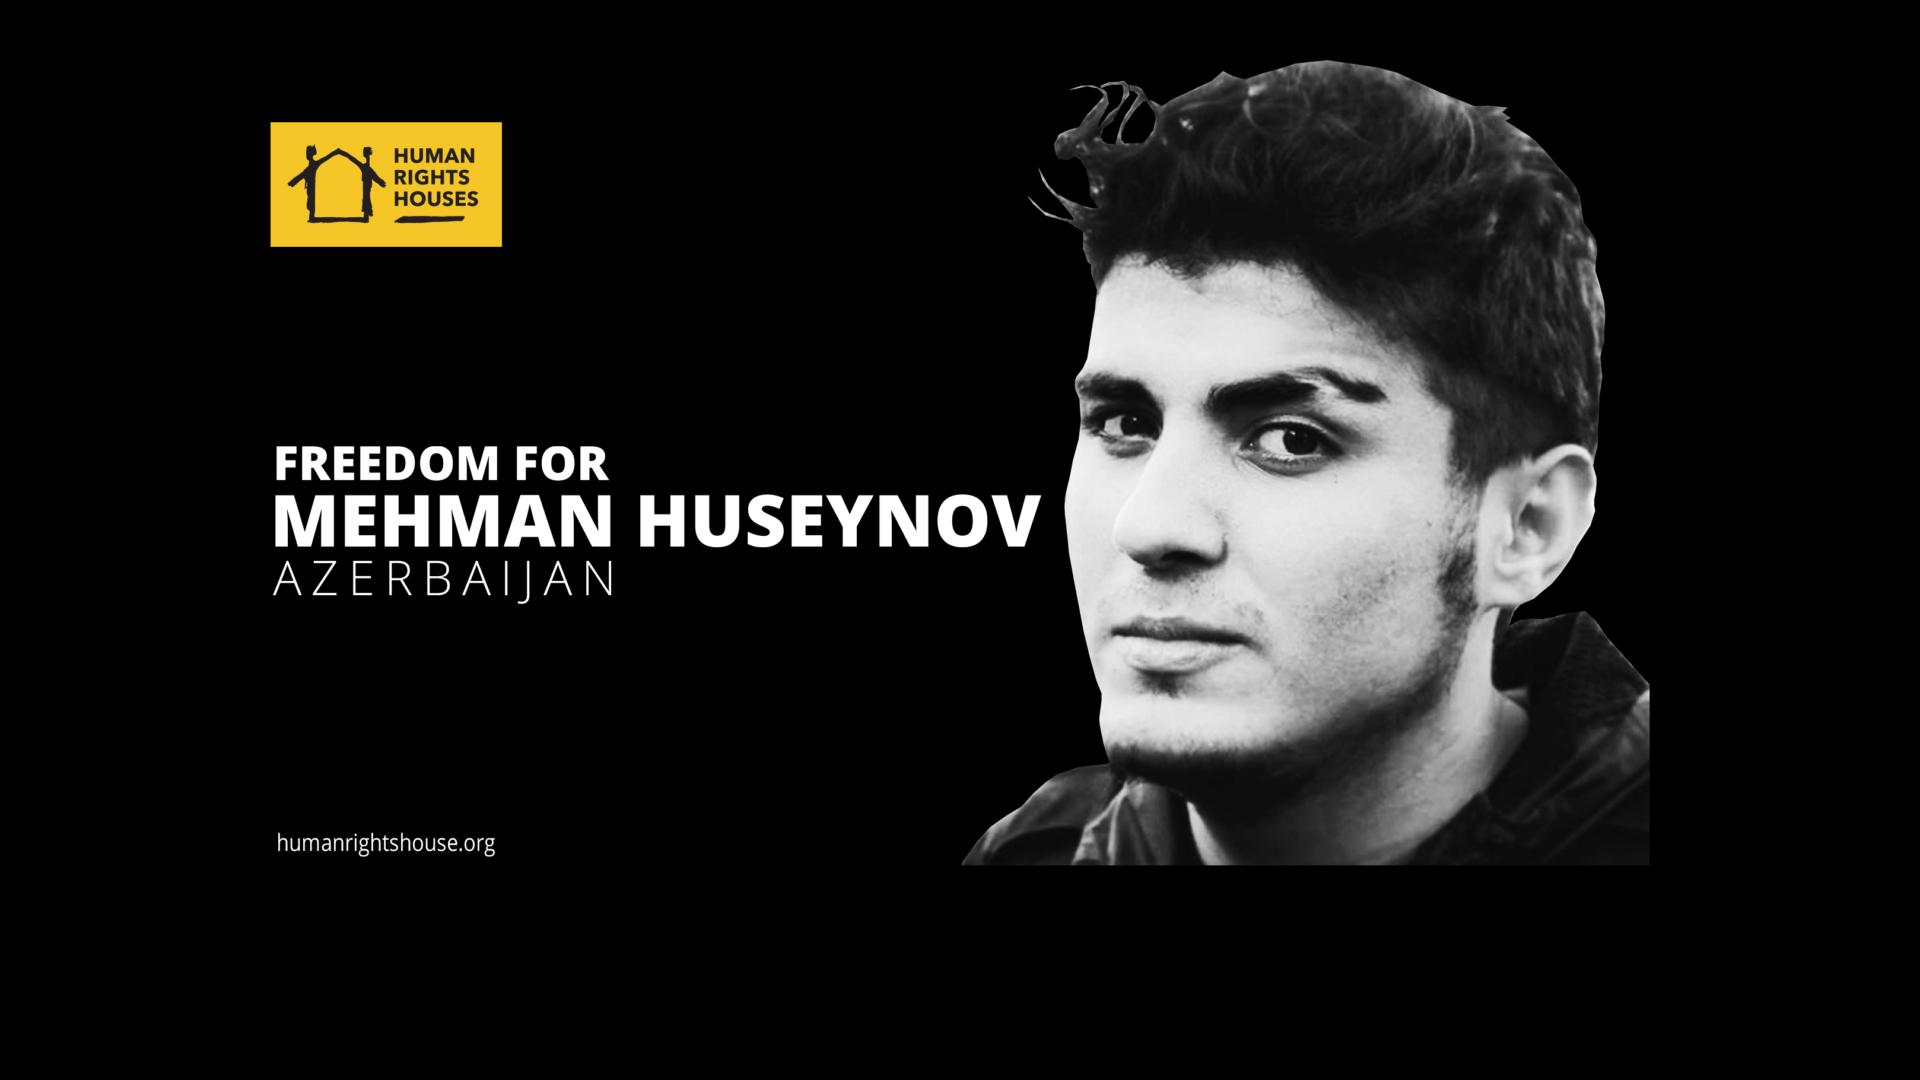 #FreeMehman / humanrightshouse.org